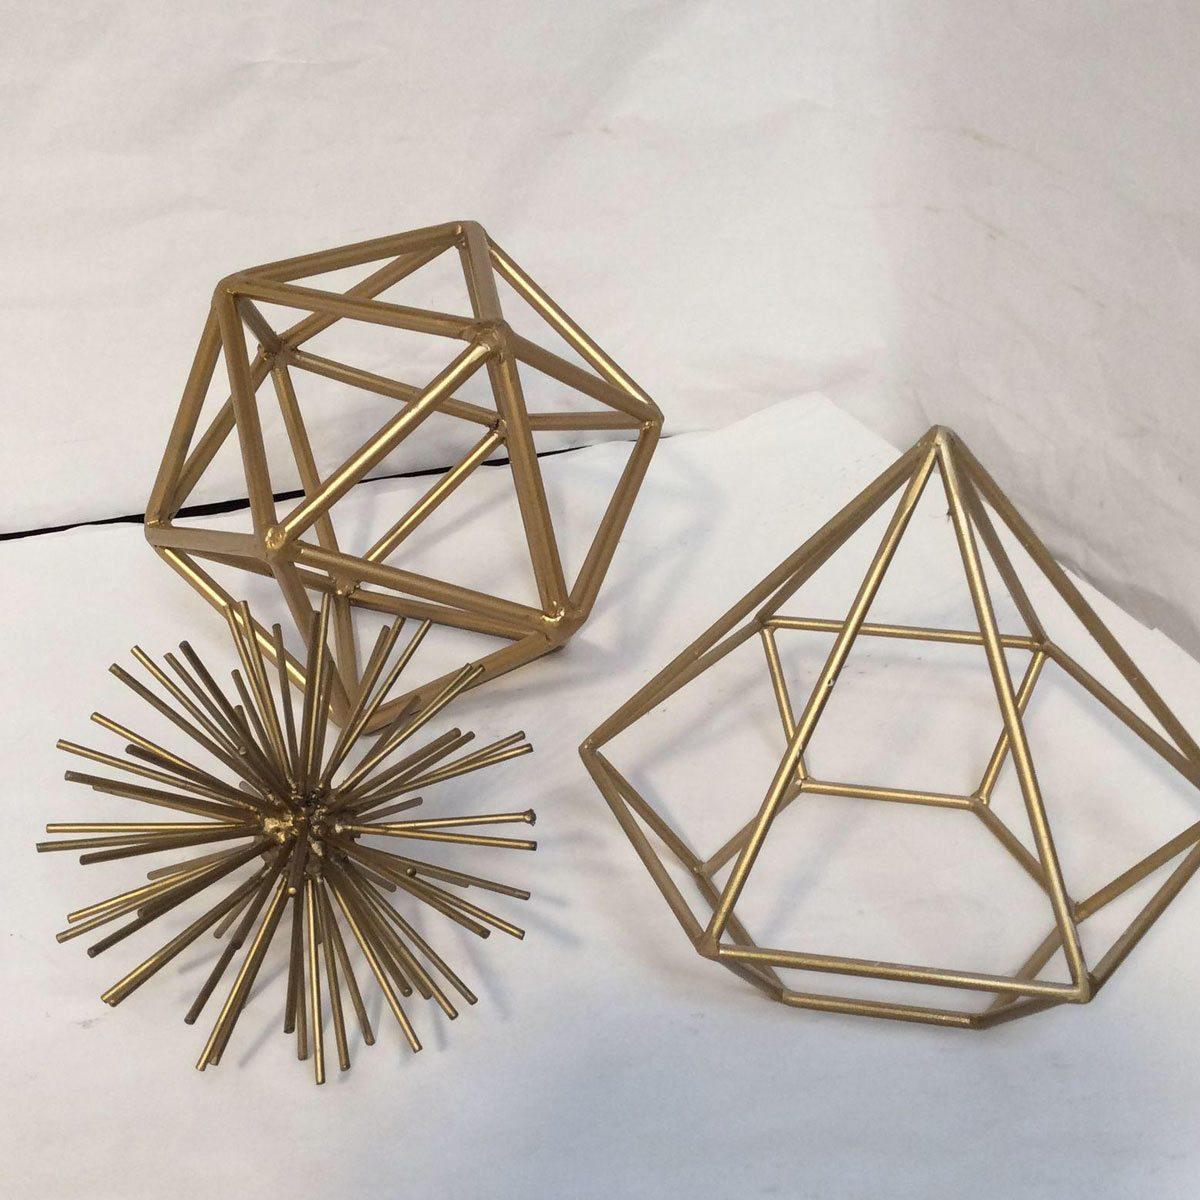 gold metal geometric shapes